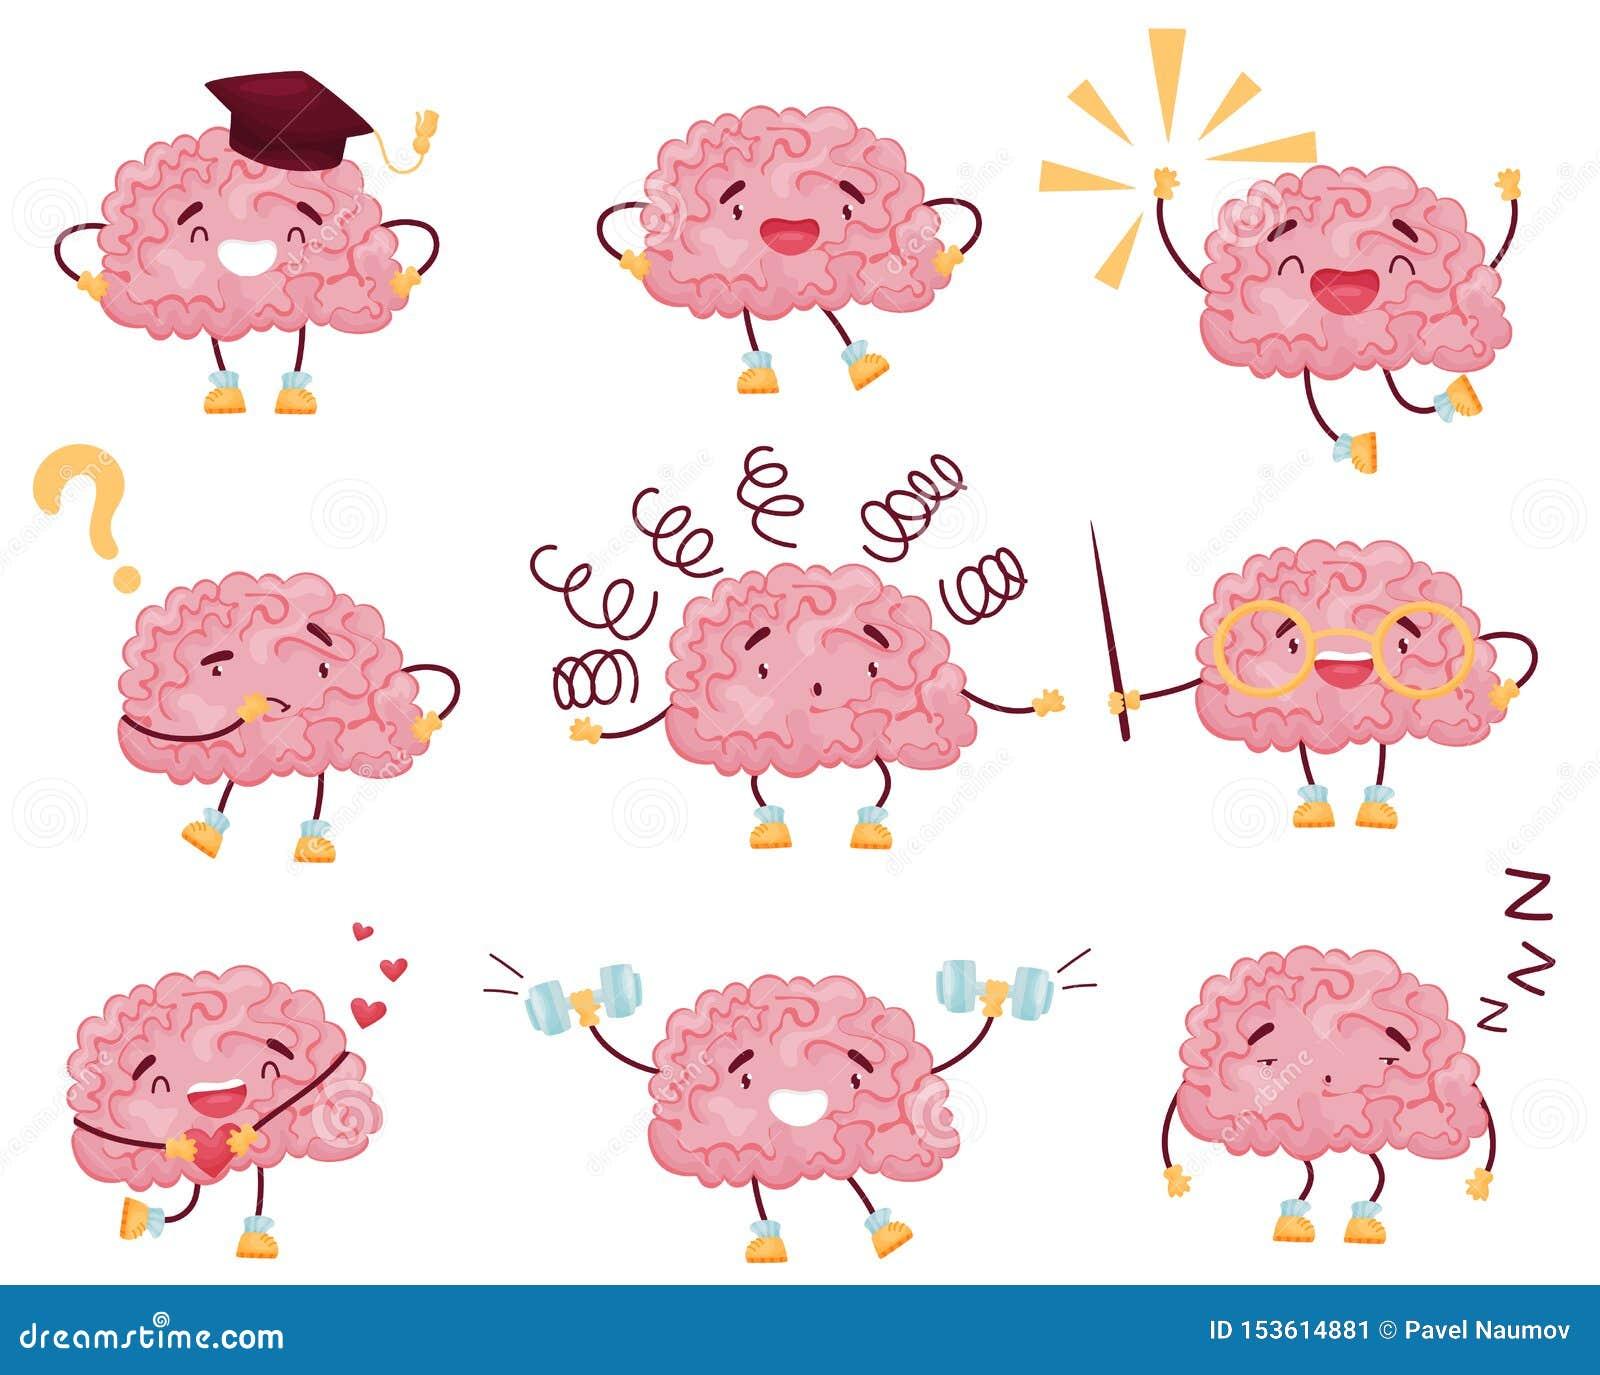 Set of cartoon brain images. Vector illustration on white background.